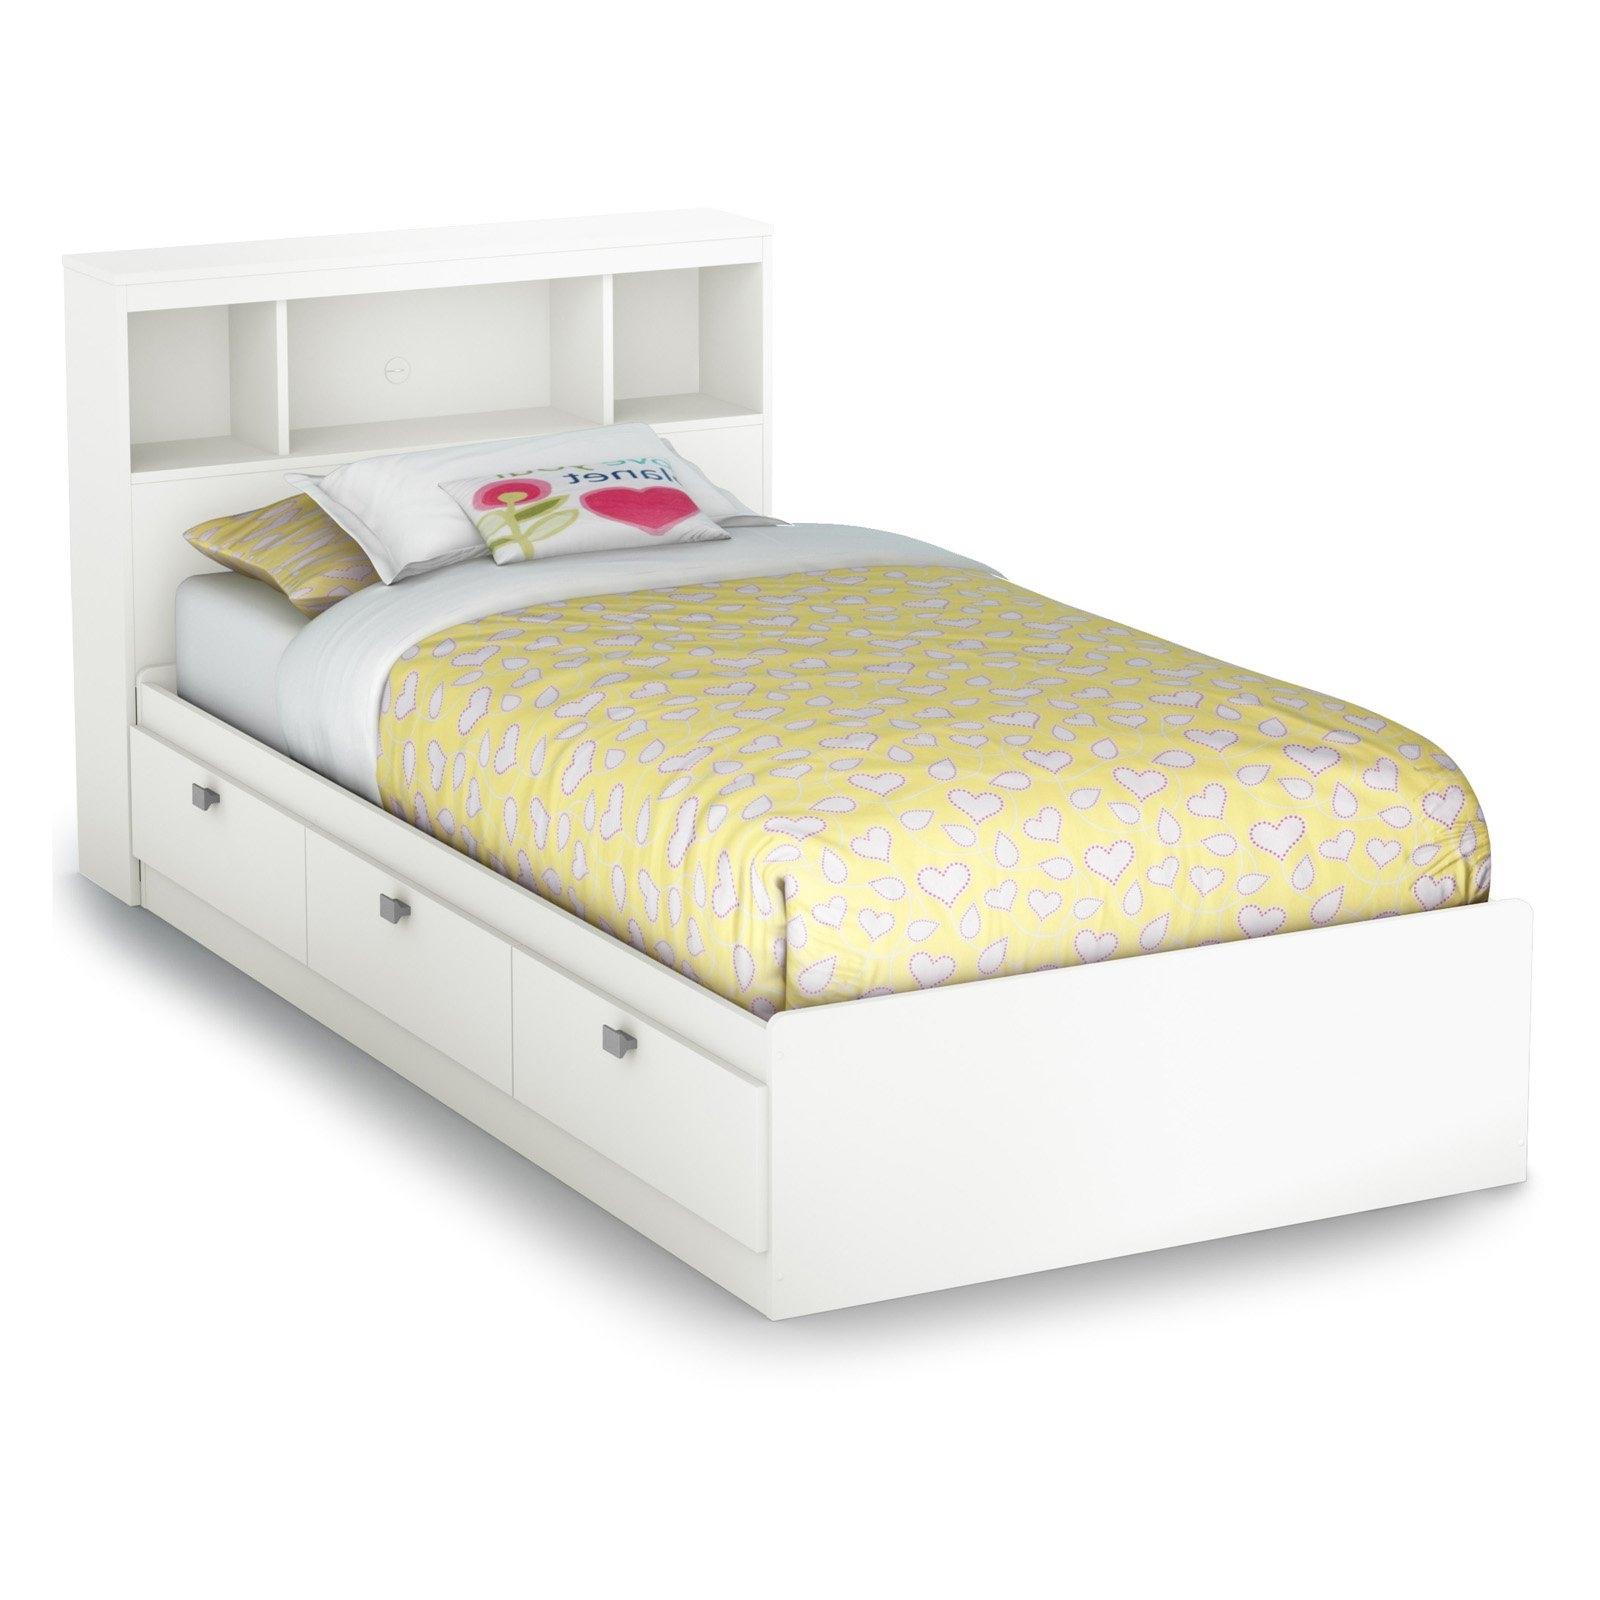 Newest Sparkling Bookcase Storage Platform Bed (View 10 of 15)